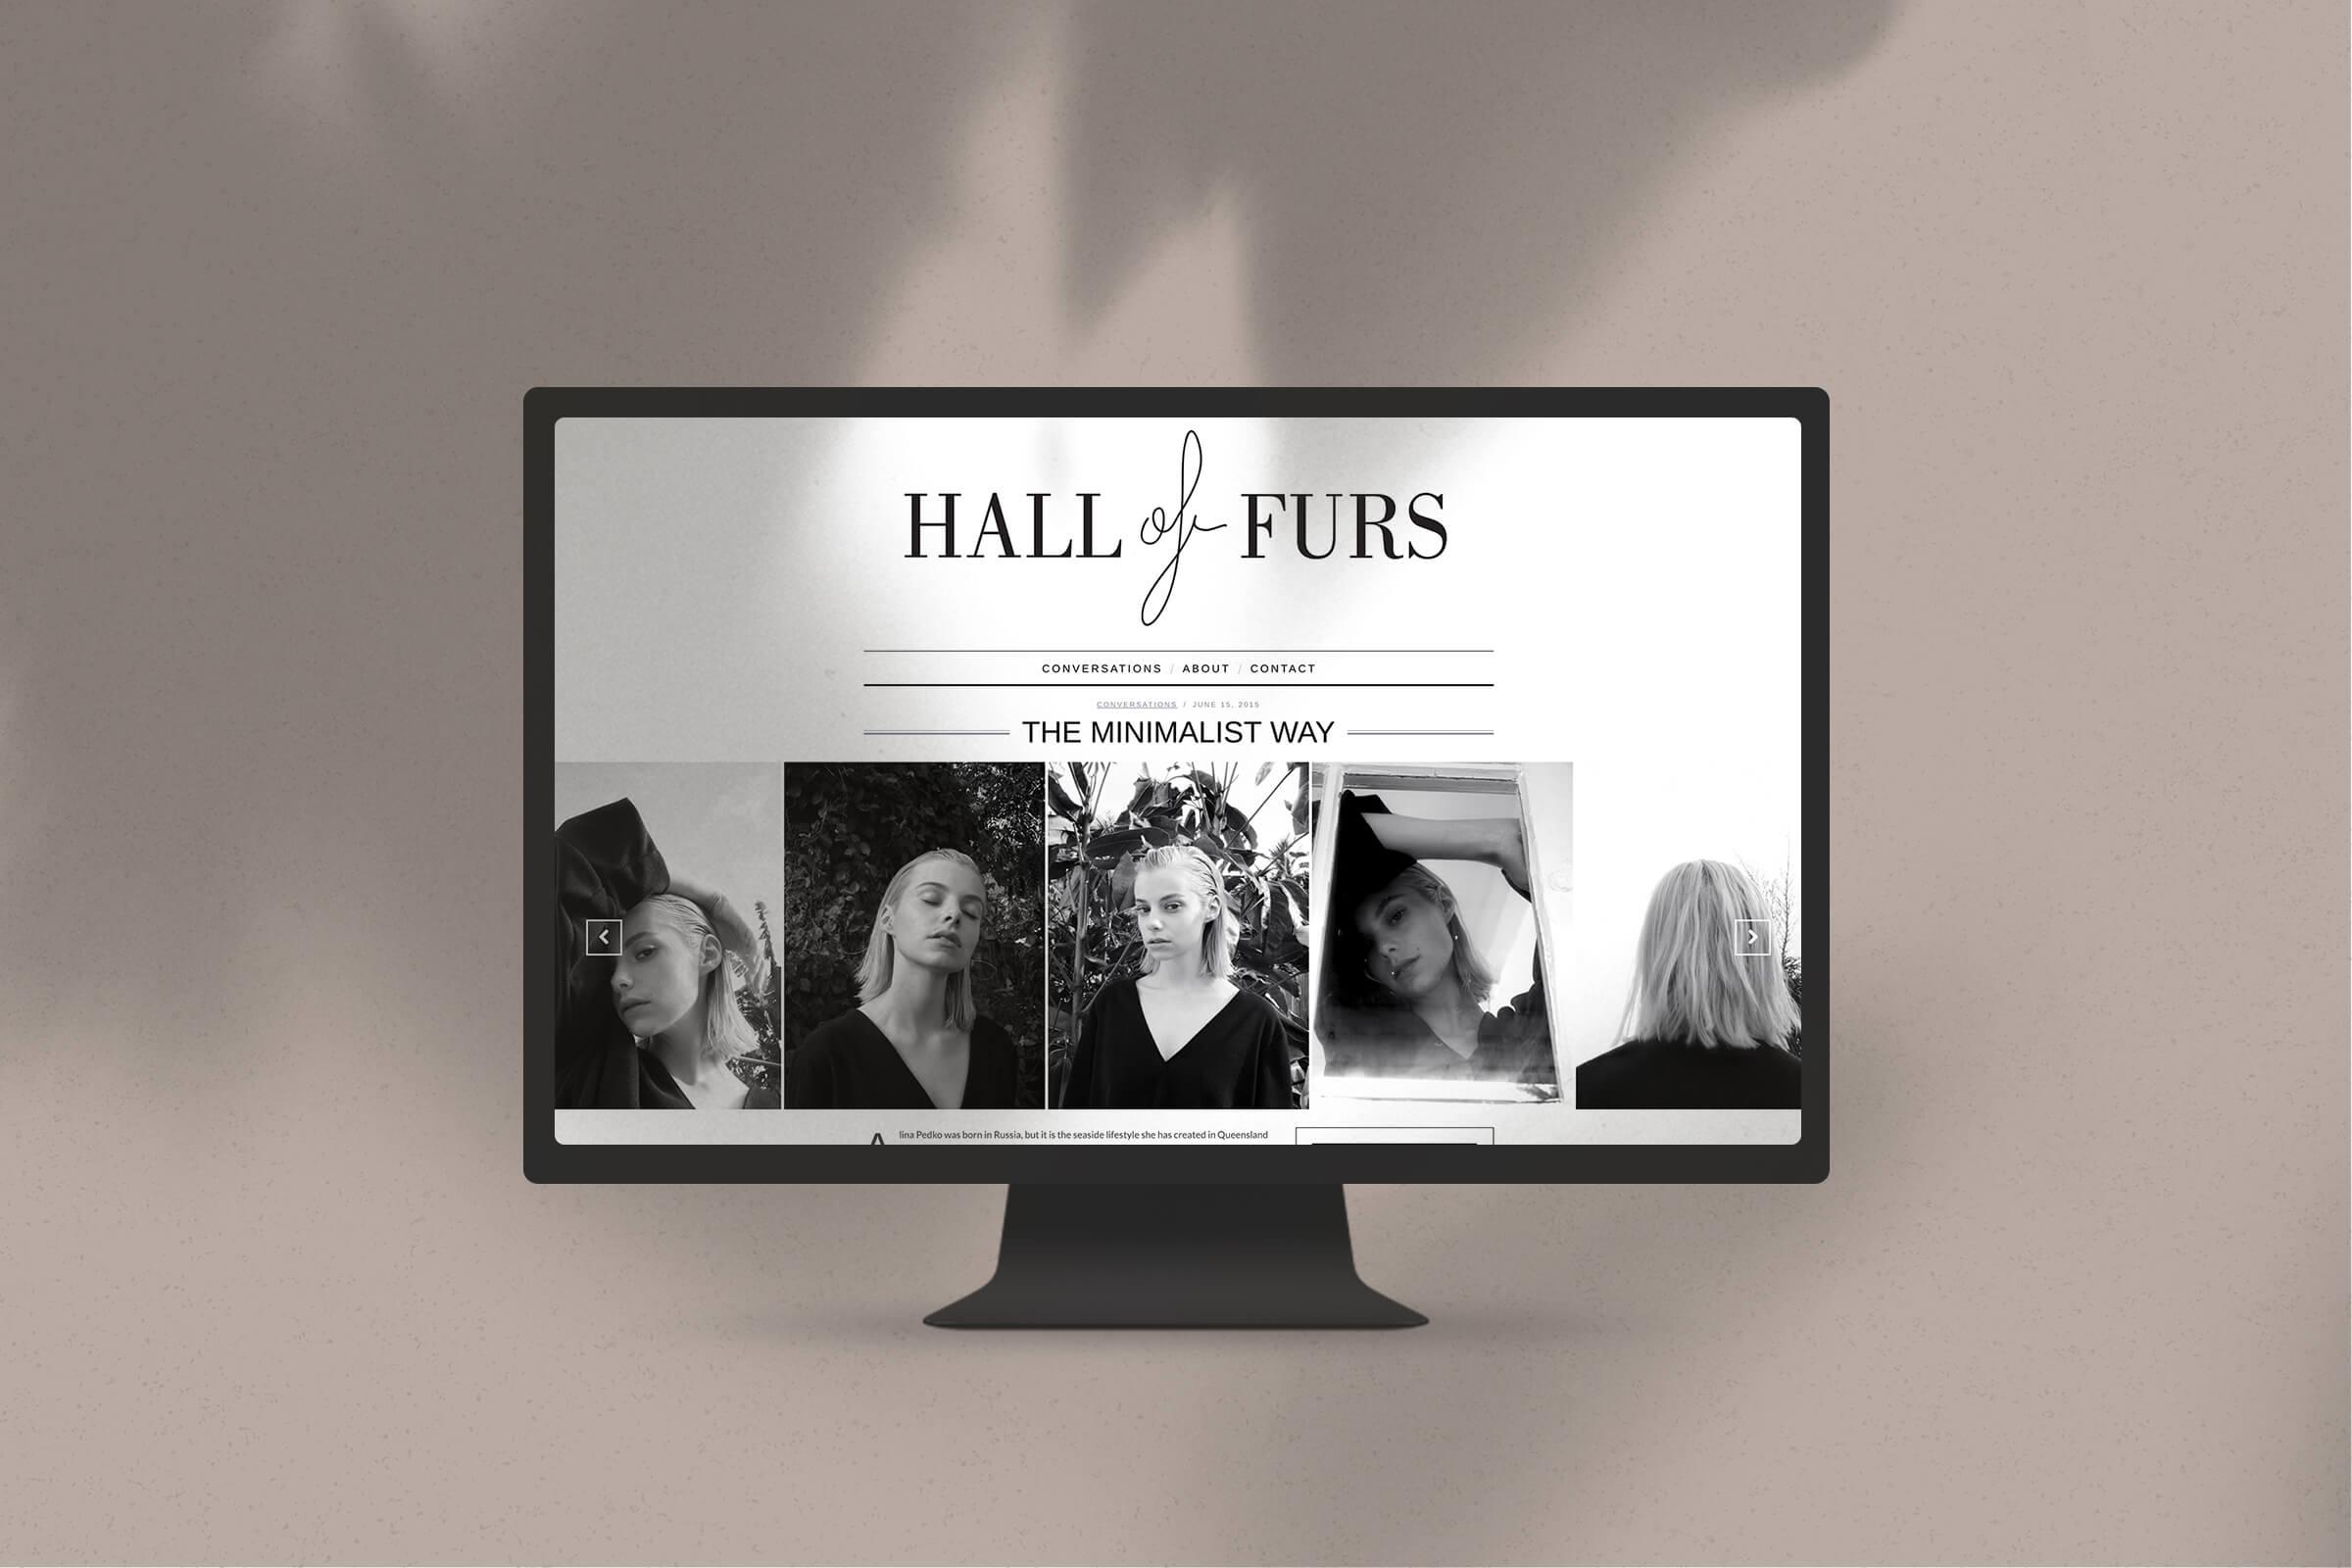 hall-of-furs-mock